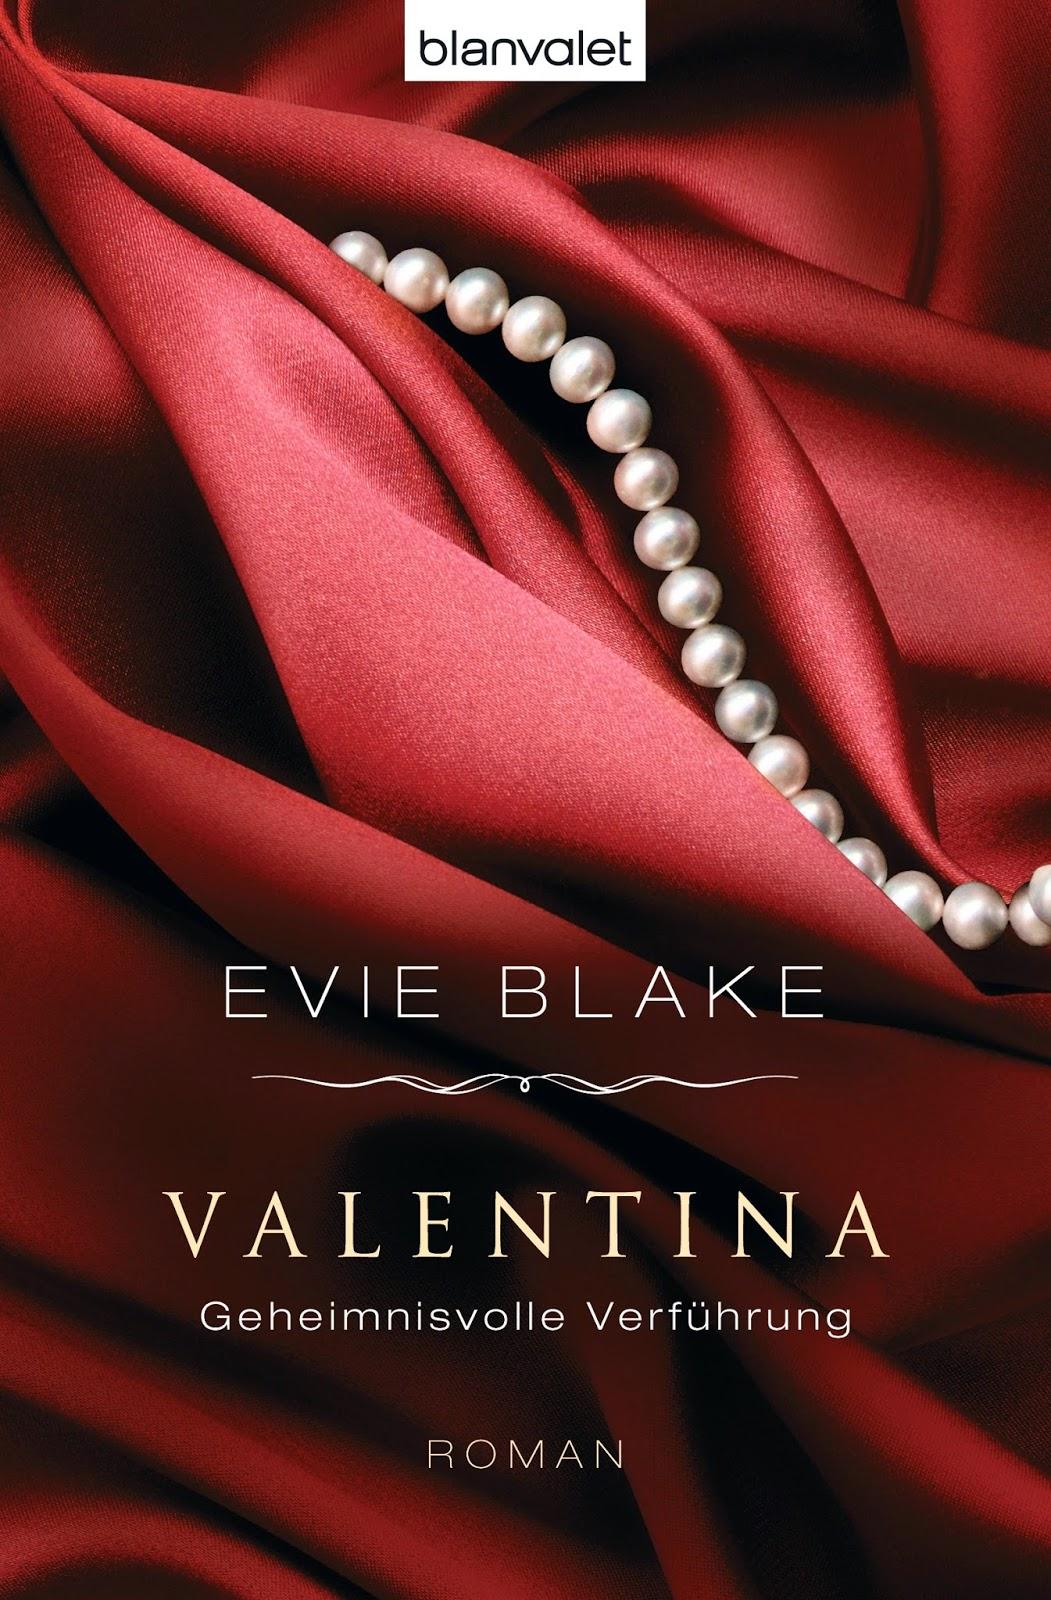 http://www.randomhouse.de/Presse/Paperback/Valentina-3-Geheimnisvolle-Verfuehrung-Roman/Evie-Blake/pr443689.rhd?mid=5&showpdf=false&per=508953#tabbox